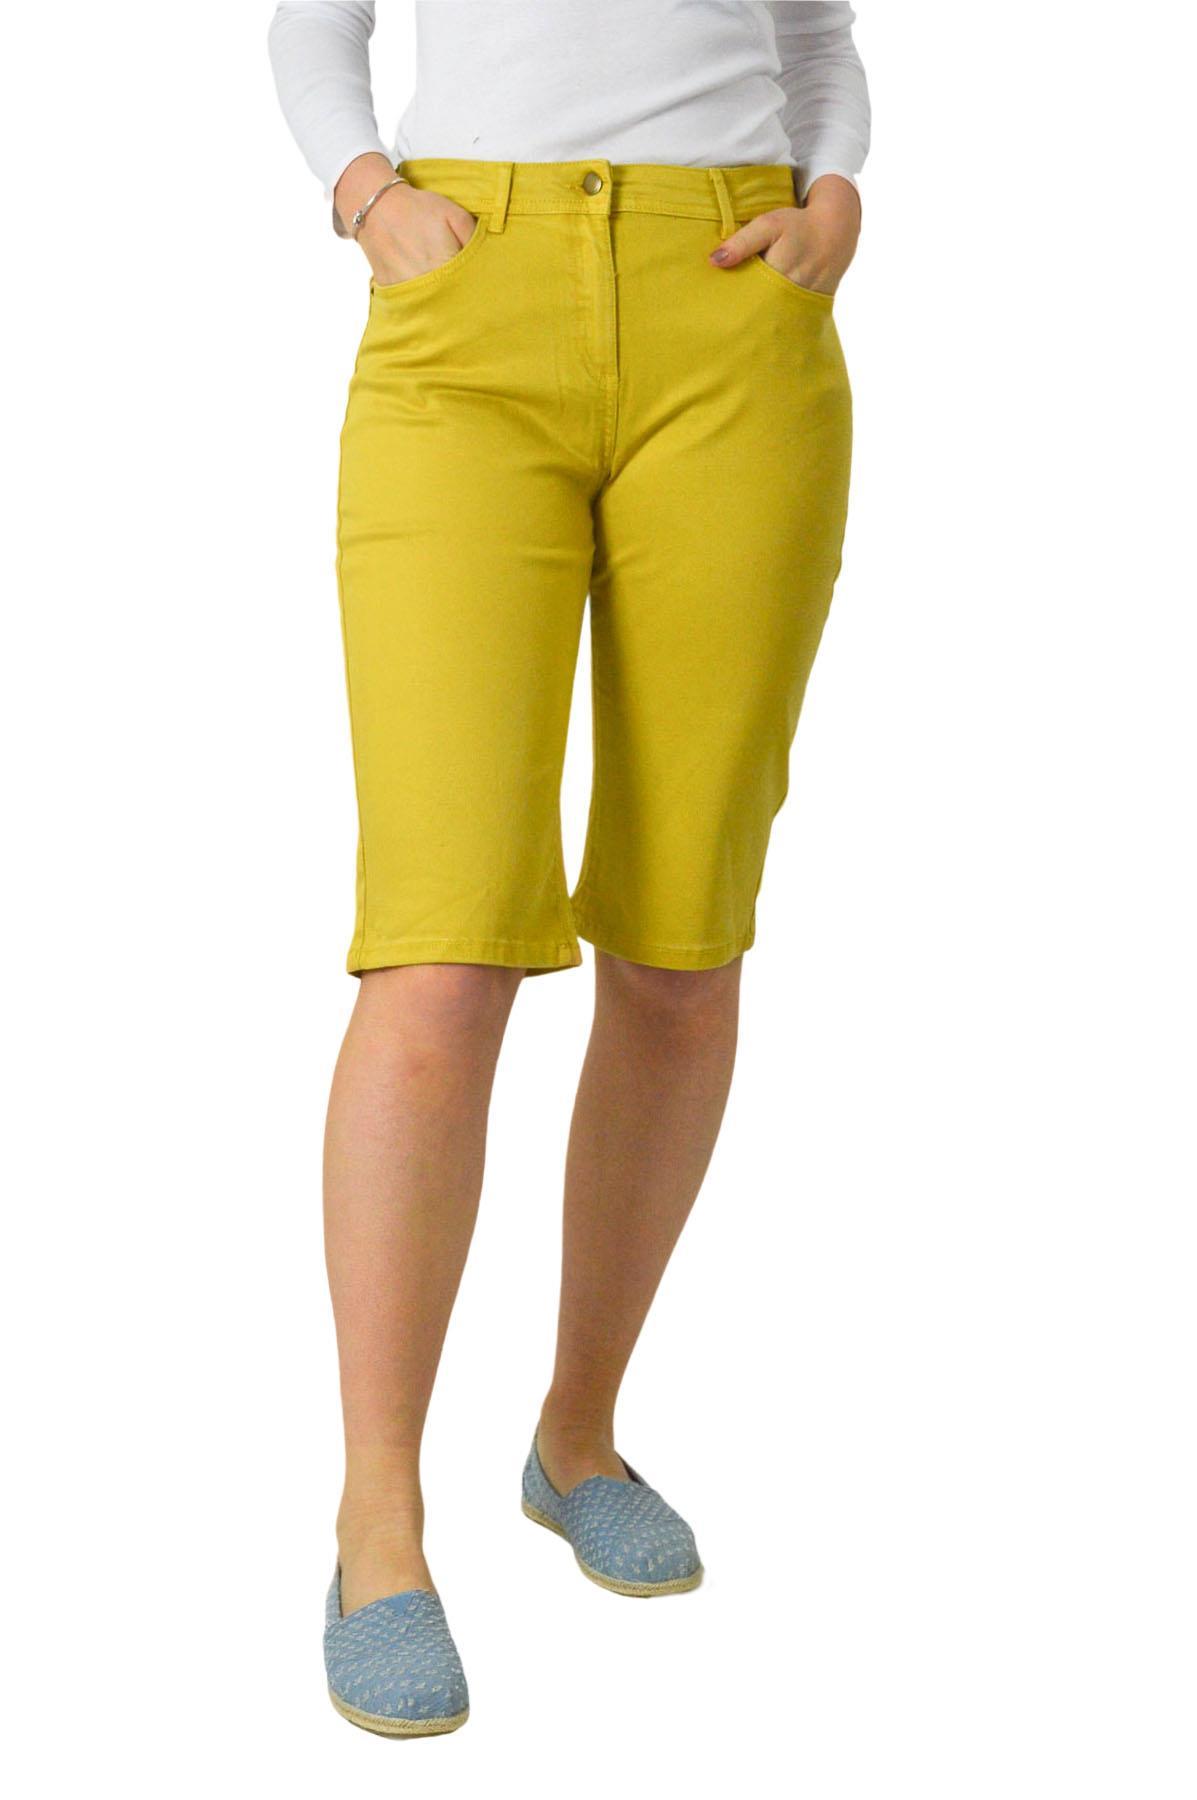 Ex N*xt Womens Soft Stretch Above Knee Shorts Pink Khaki Mustard Size 10-20